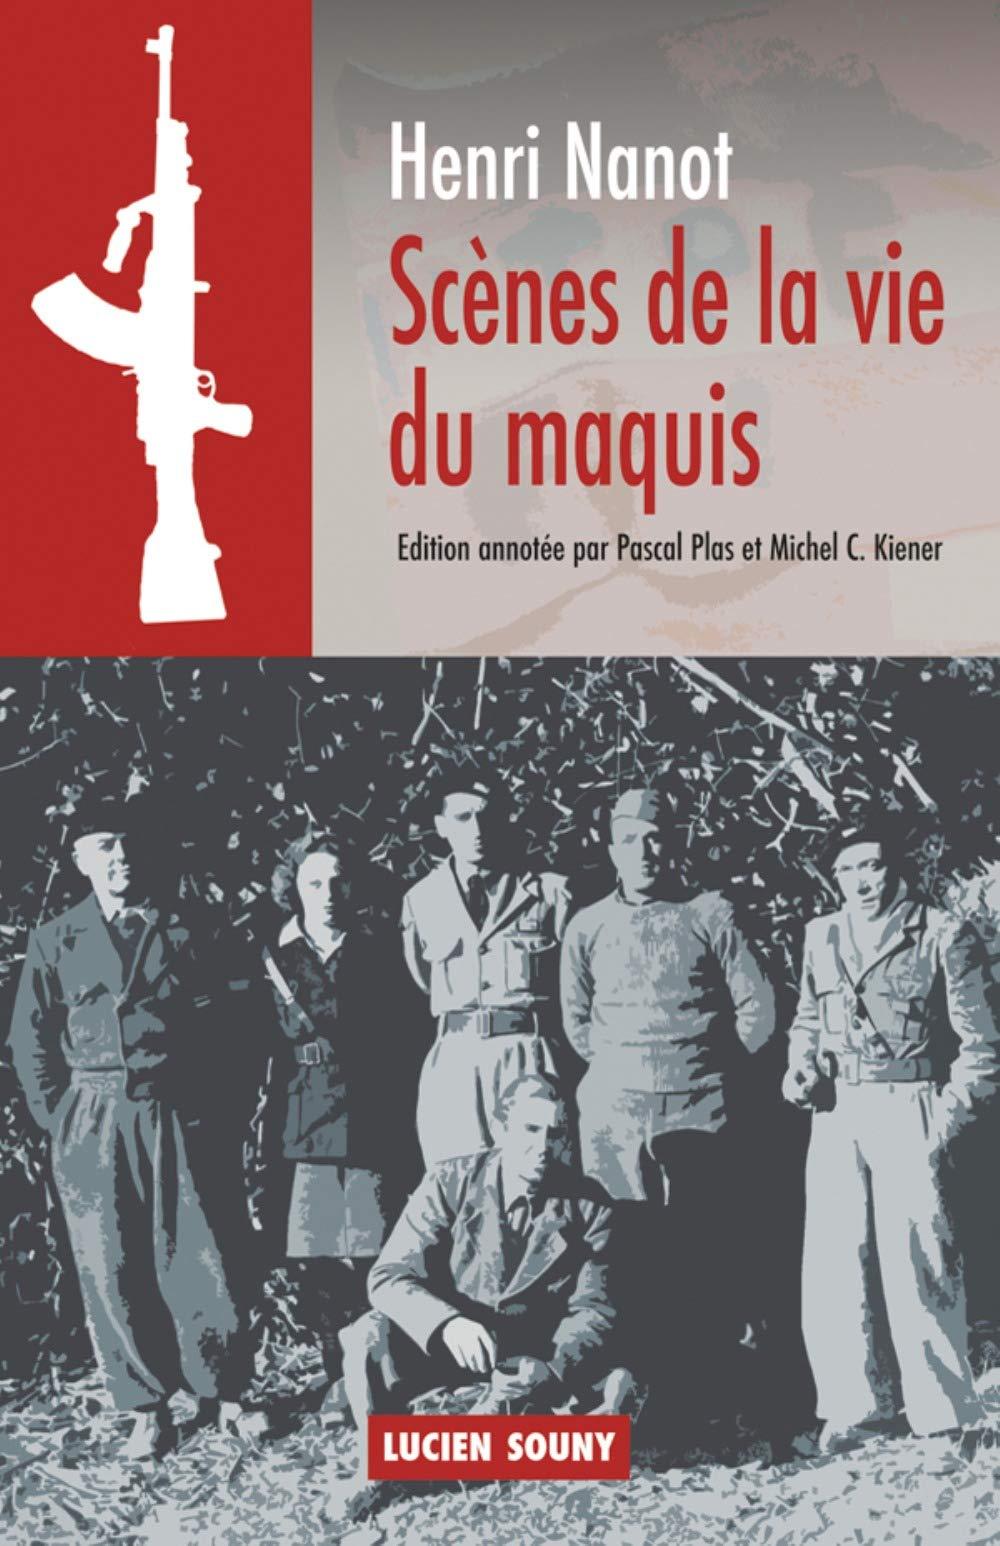 Scènes de la vie du maquis (HISTOIRE): Amazon.es: Nanot, Henri, Plas, Pascal, Kiener, Michel: Libros en idiomas extranjeros